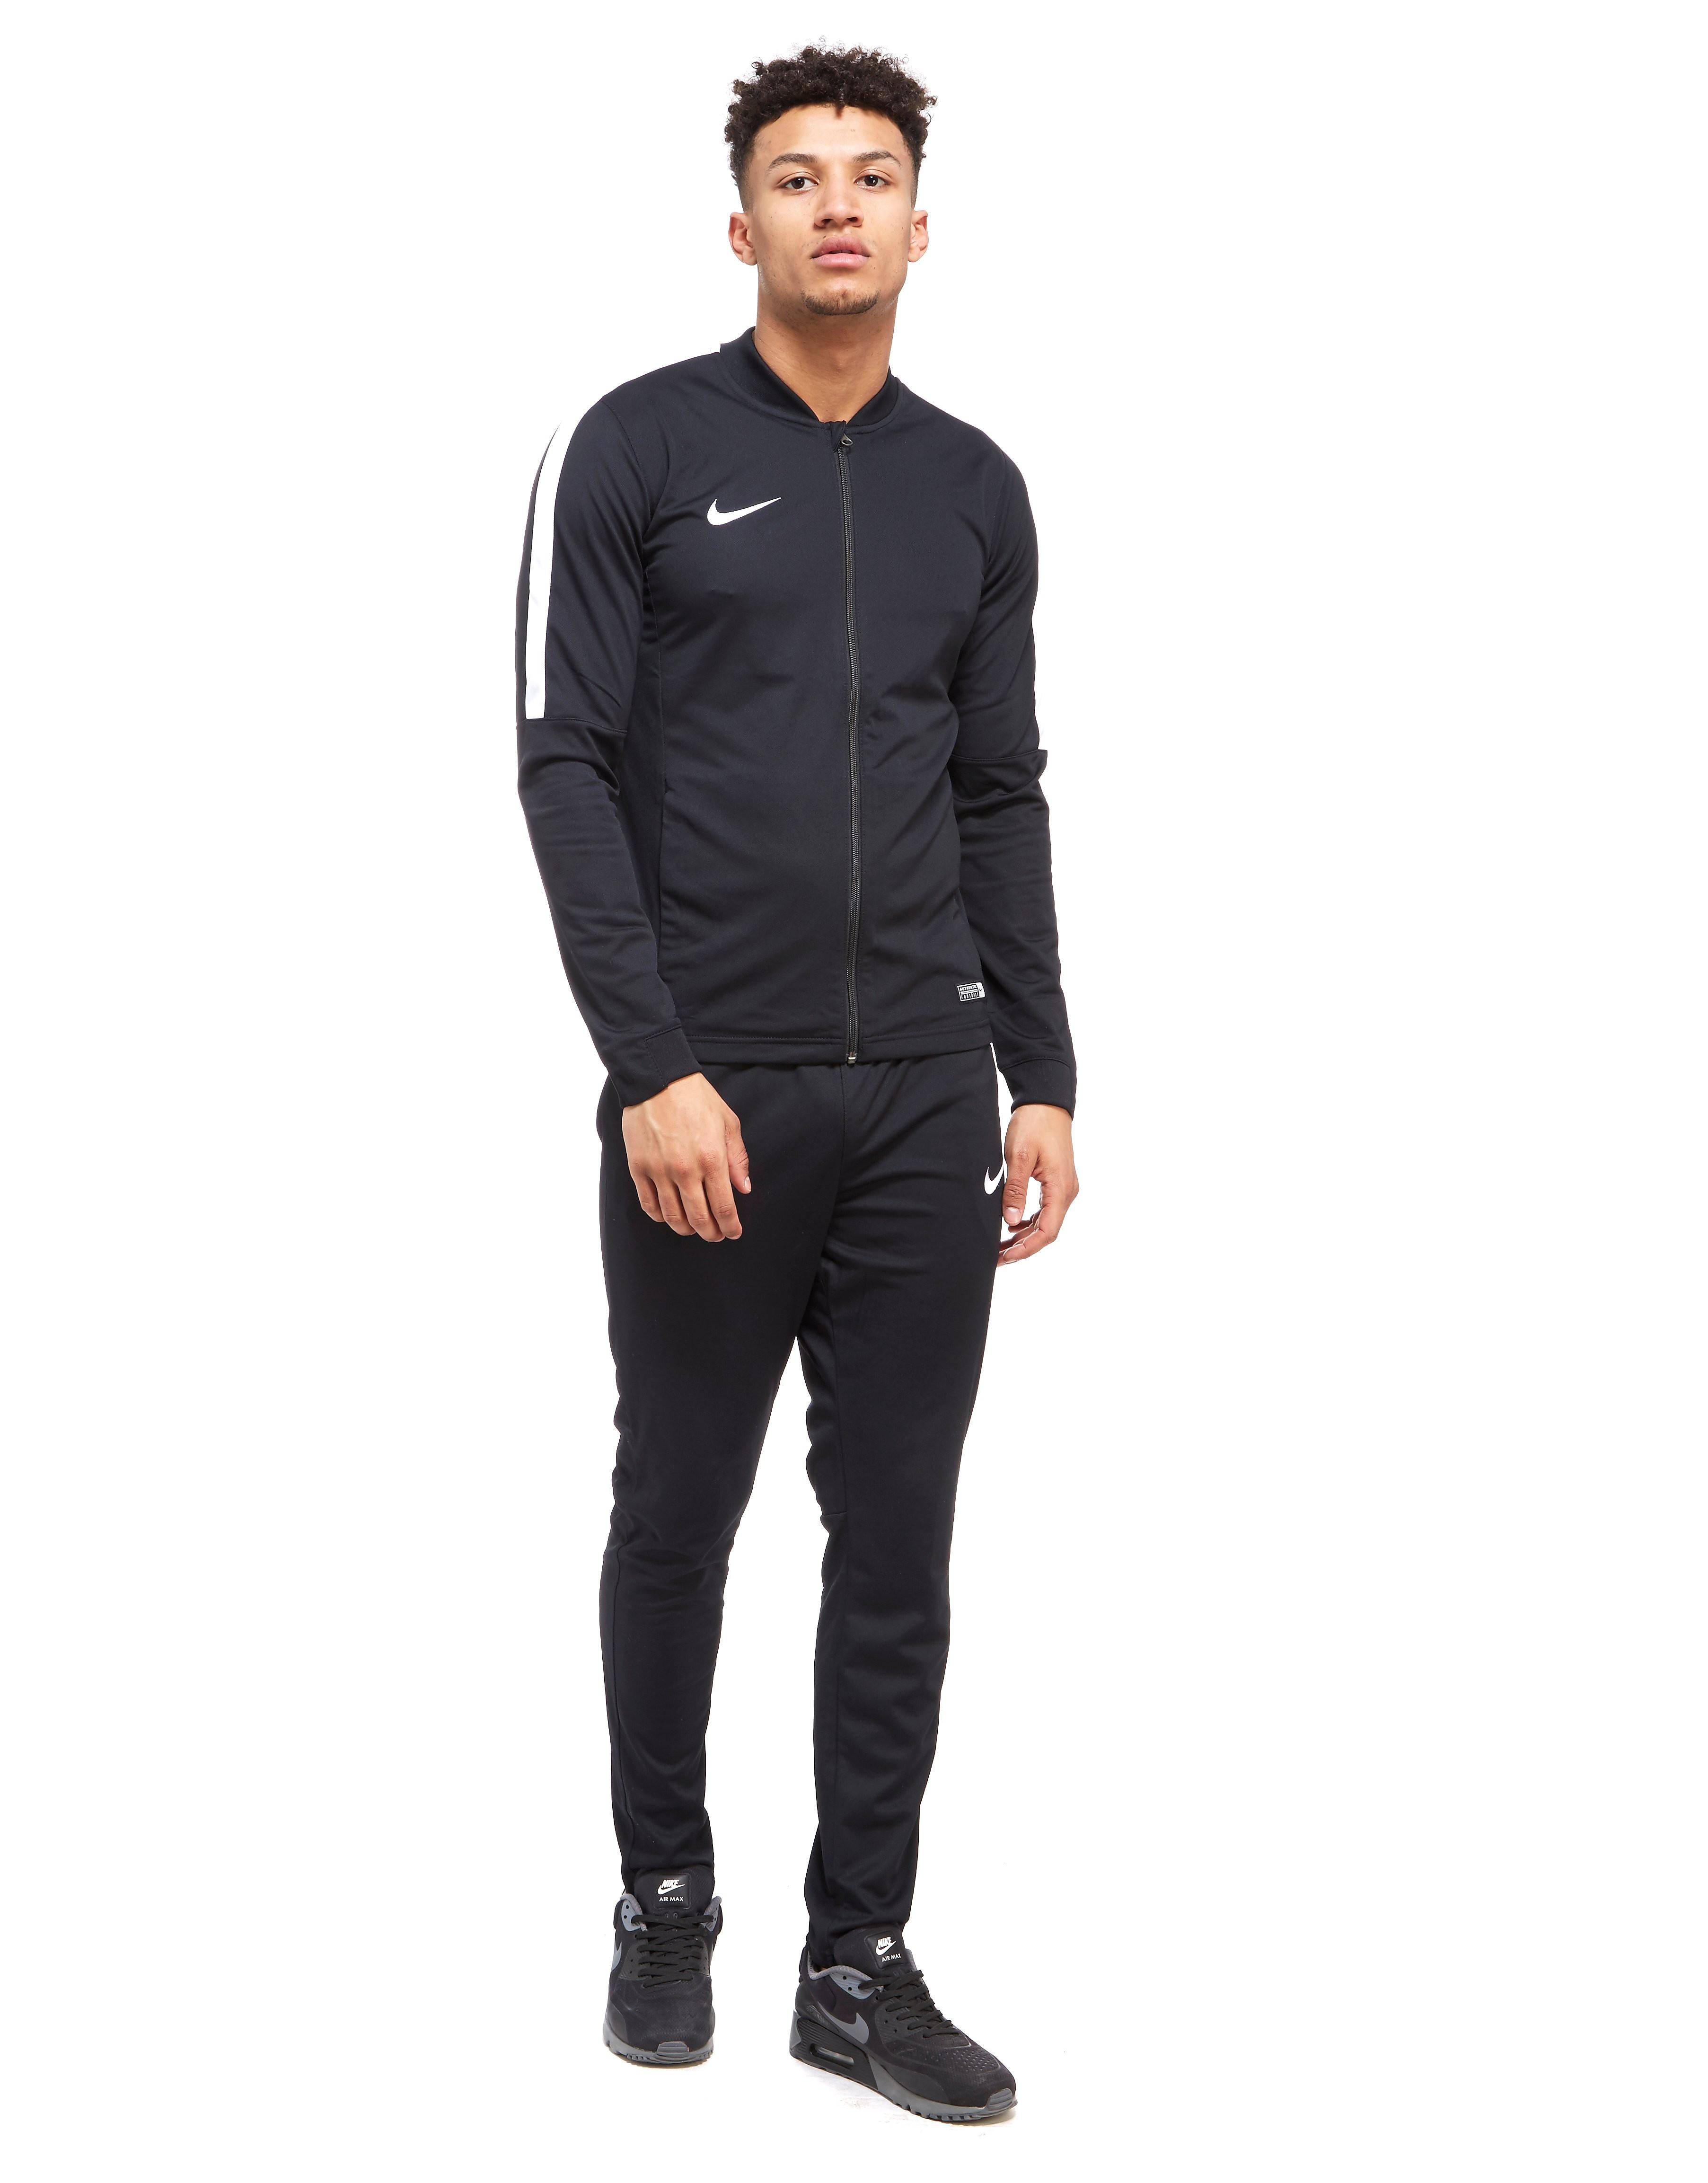 Nike Academy 16 Suit